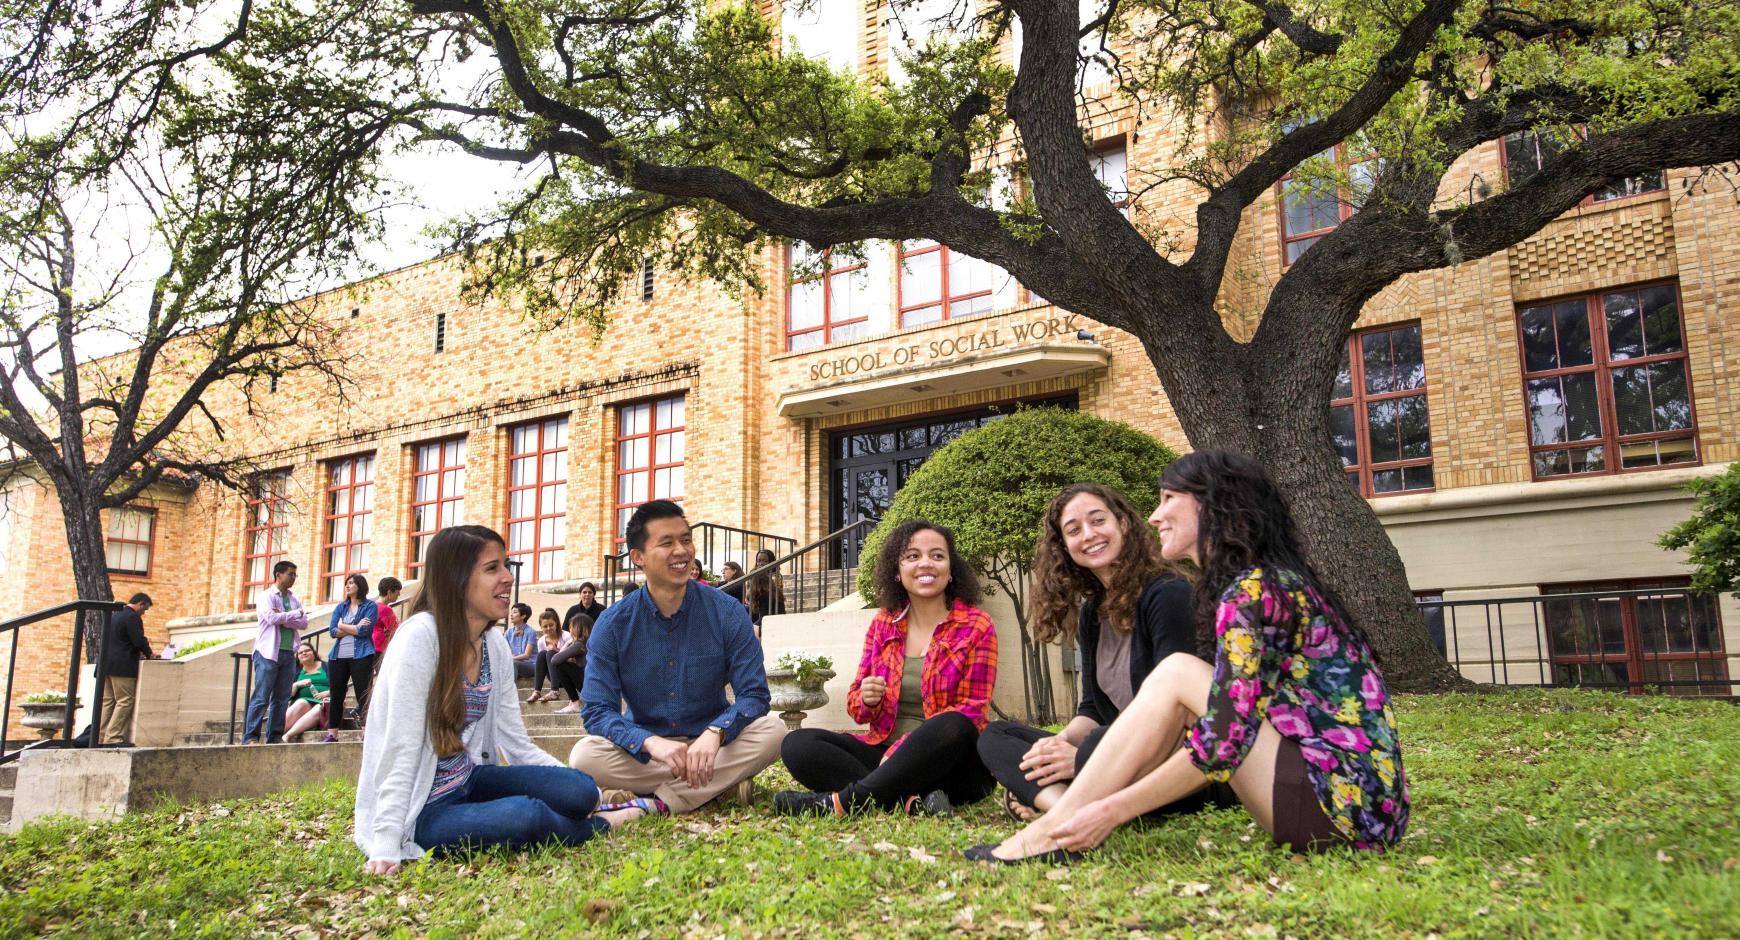 University of Texas at Austin School of Social Work